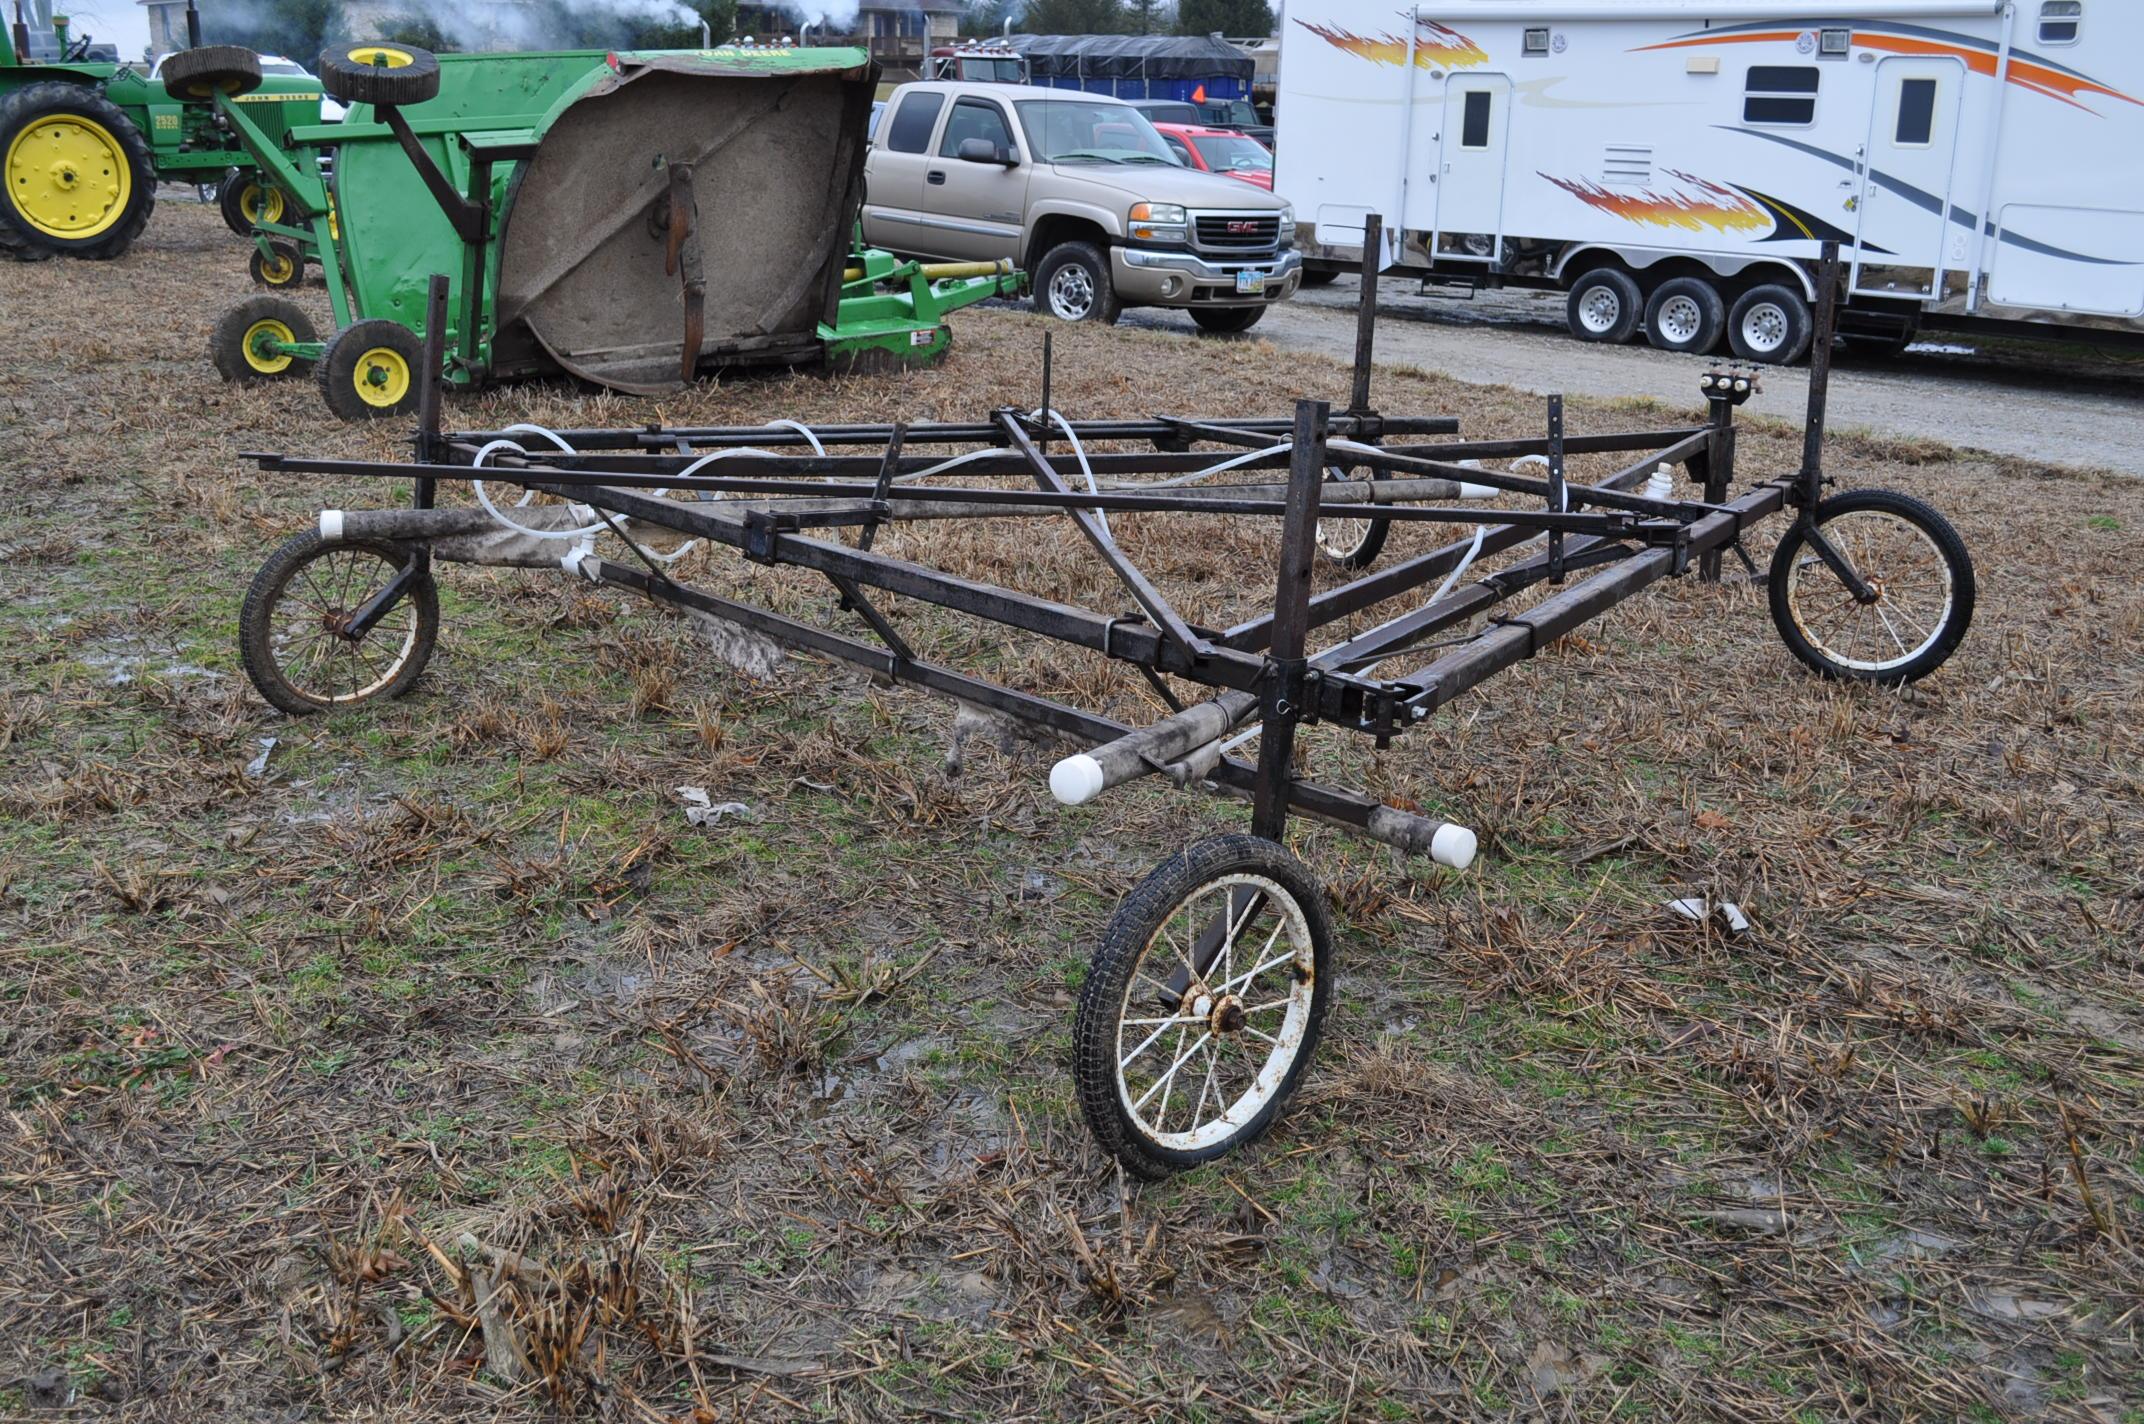 30' Quality Metal Works weed wiper cart, needs work - Image 3 of 11